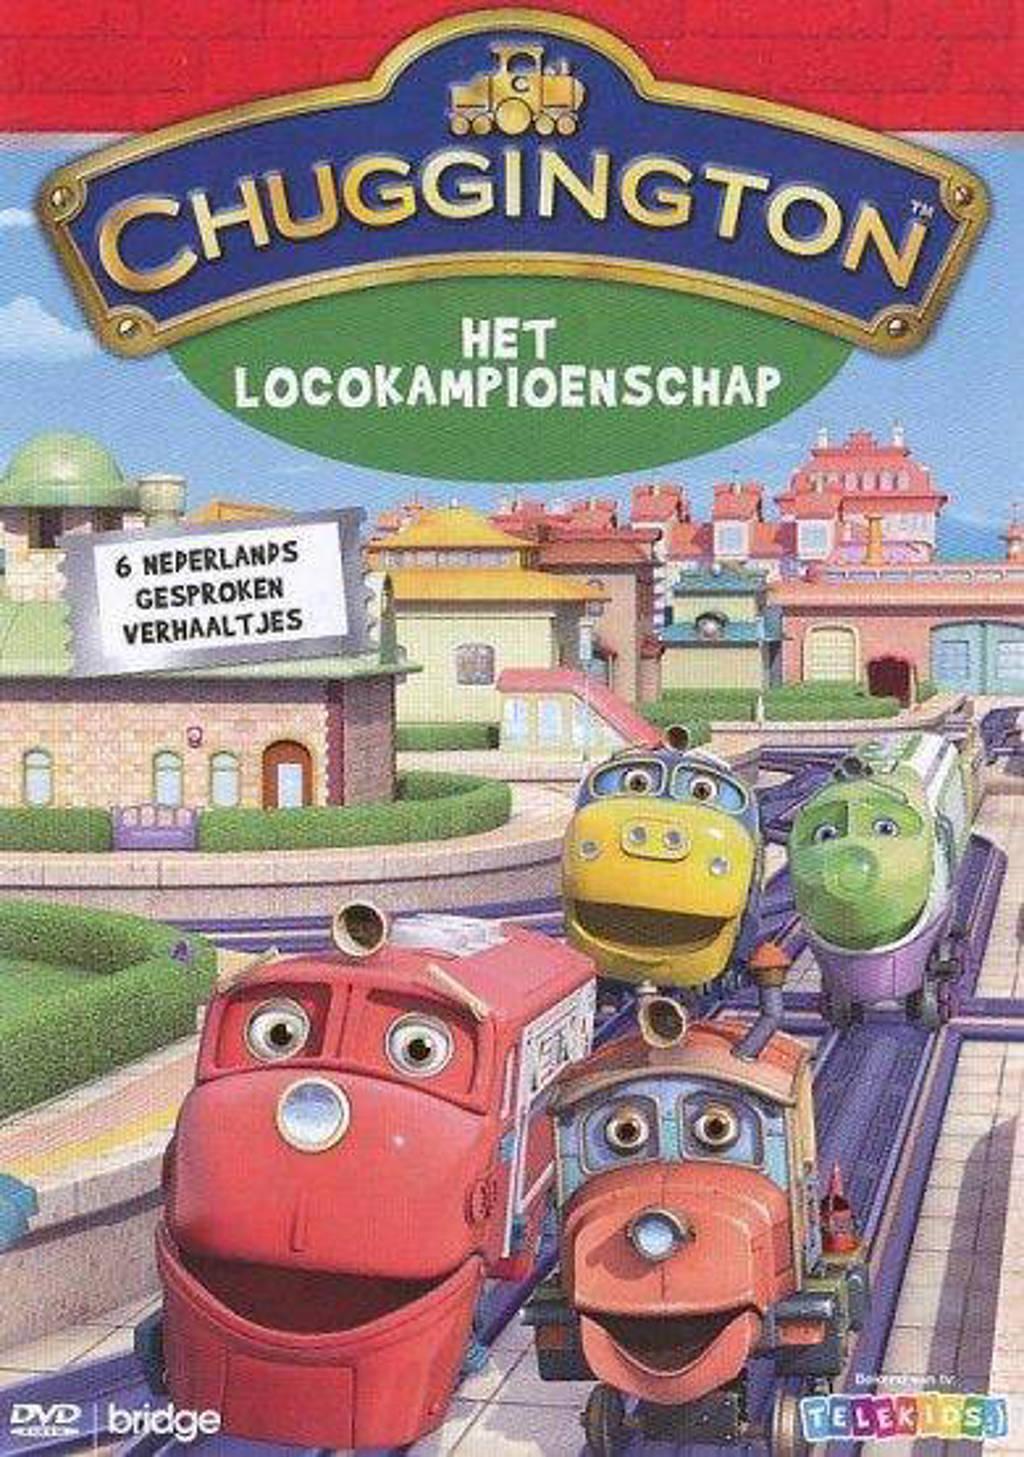 Chuggington - Locokampioenschap (DVD)